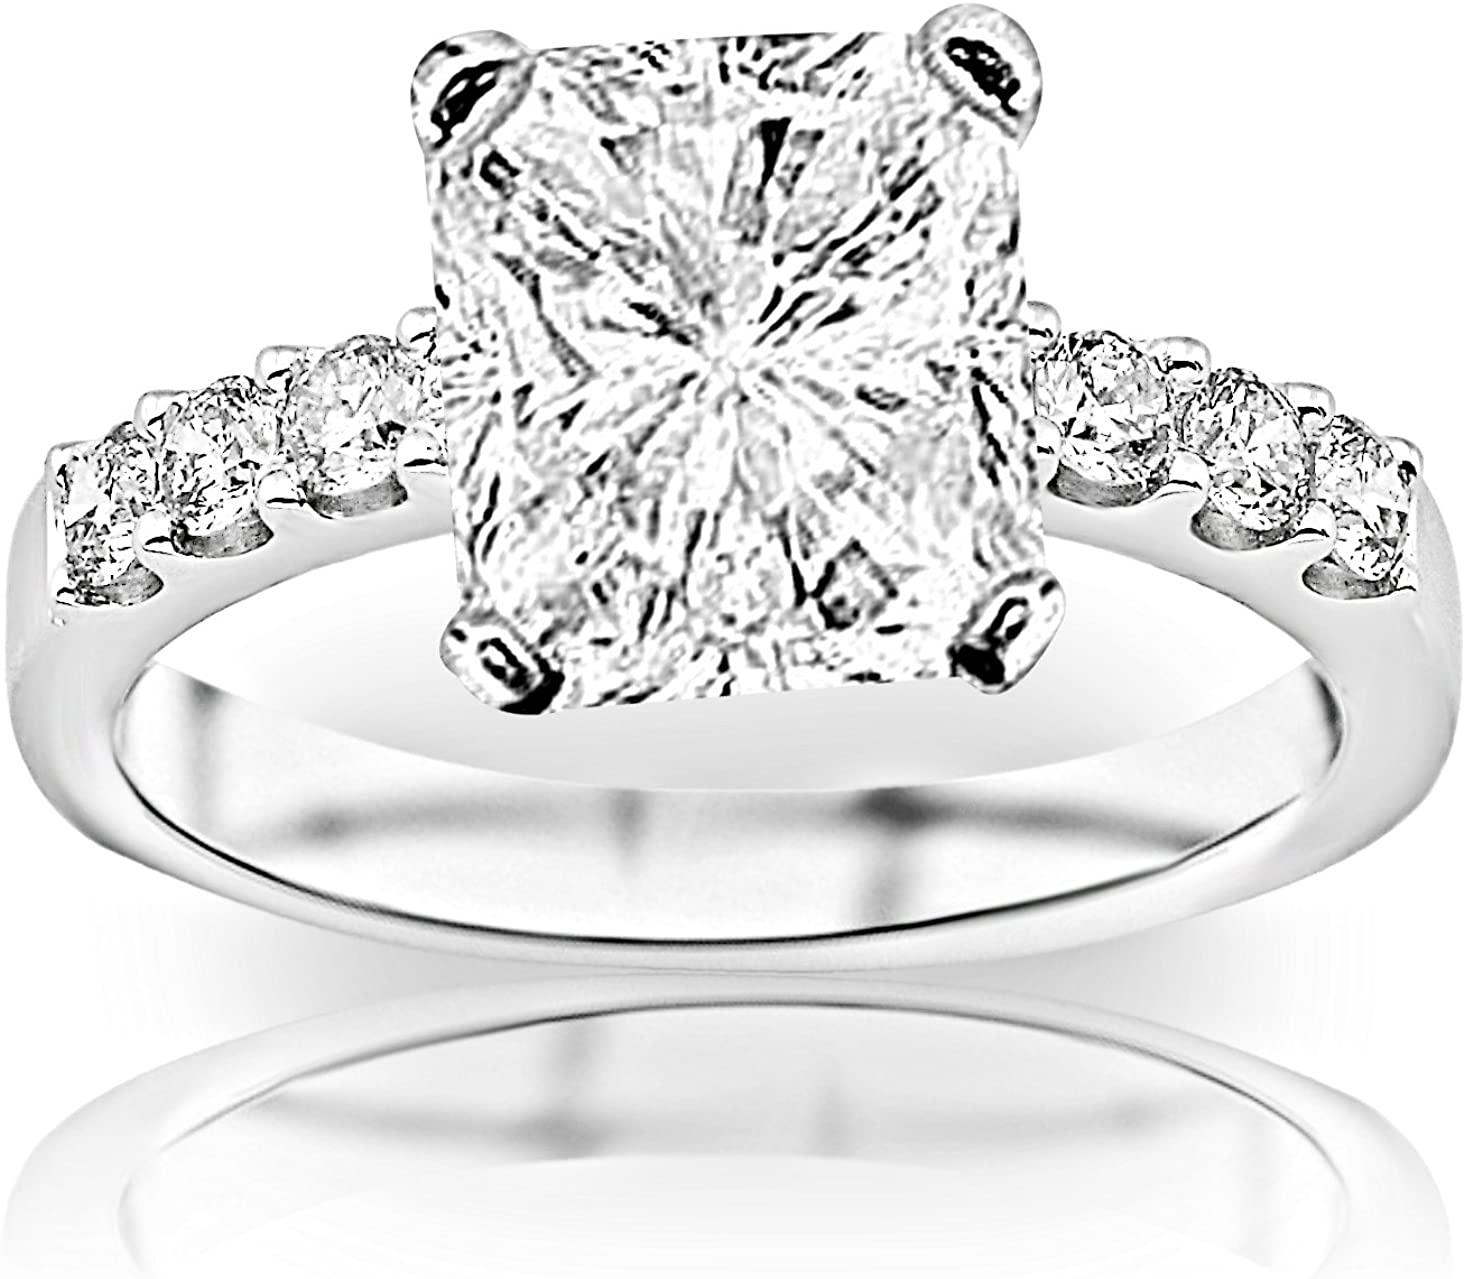 GIA Certified 0.98 Carat Radiant Cut/Shape 14K White Gold Classic Prong Set Diamond Engagement Ring 4 Prong with a 0.50 Carat, D-E Color, VVS1-VVS2 Clarity Center Stone